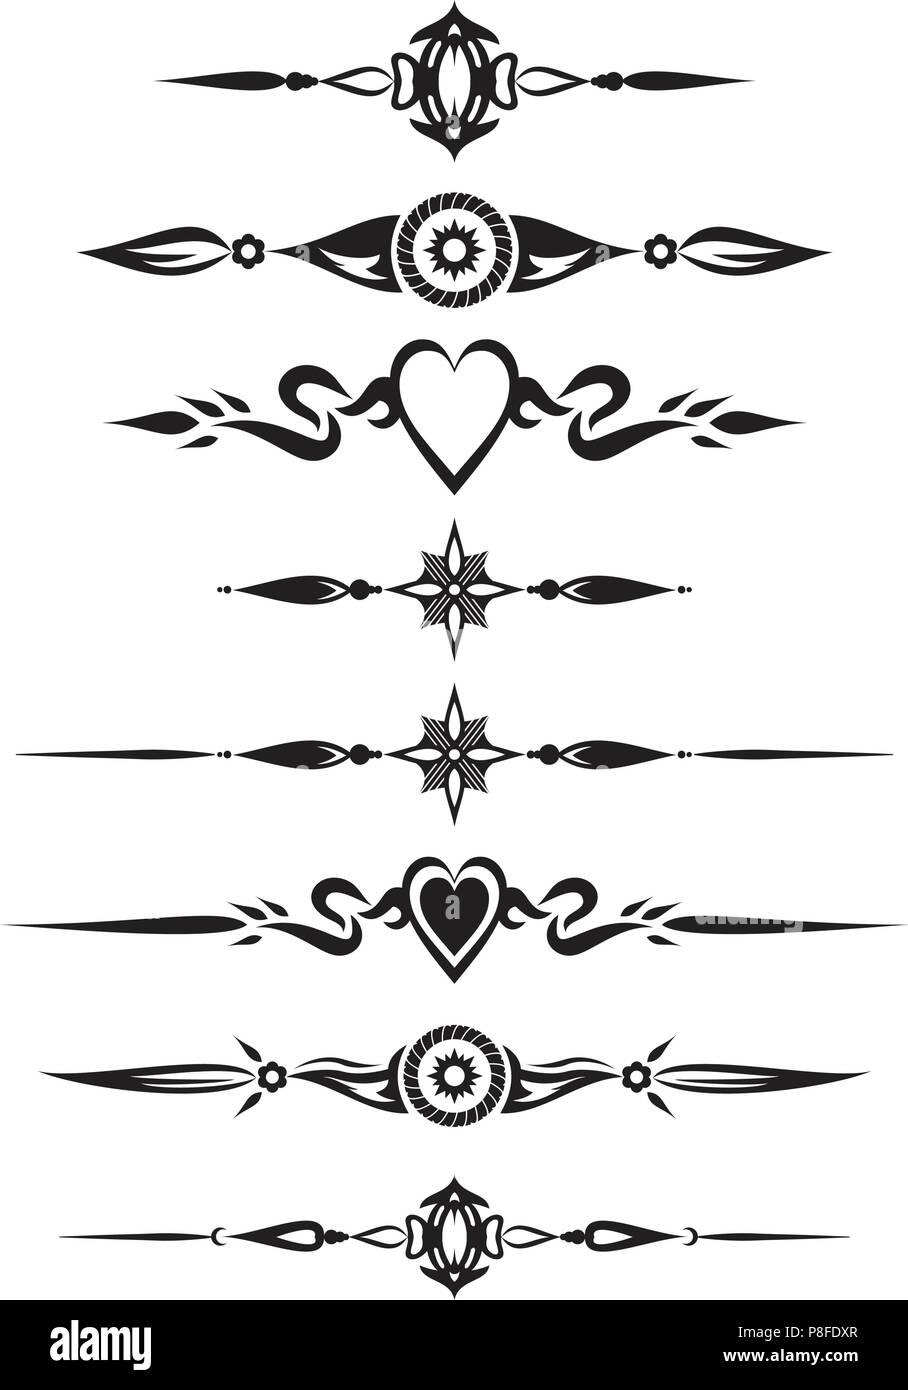 Decorative Text Divider Separator Ornament Design Element Stock